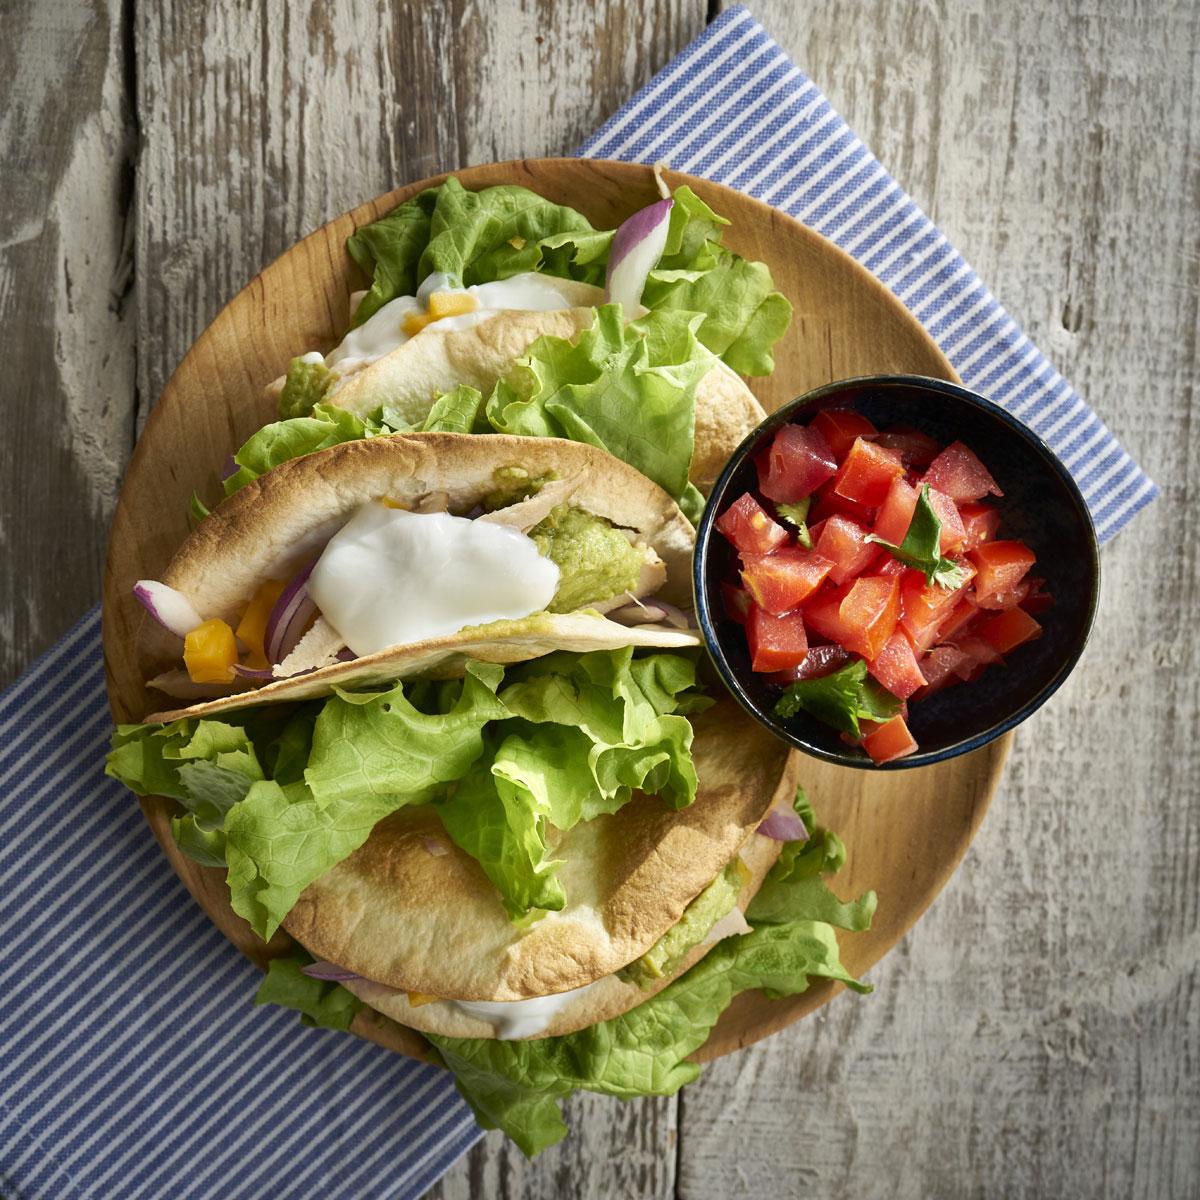 Tacos de pollo asado con pico de gallo